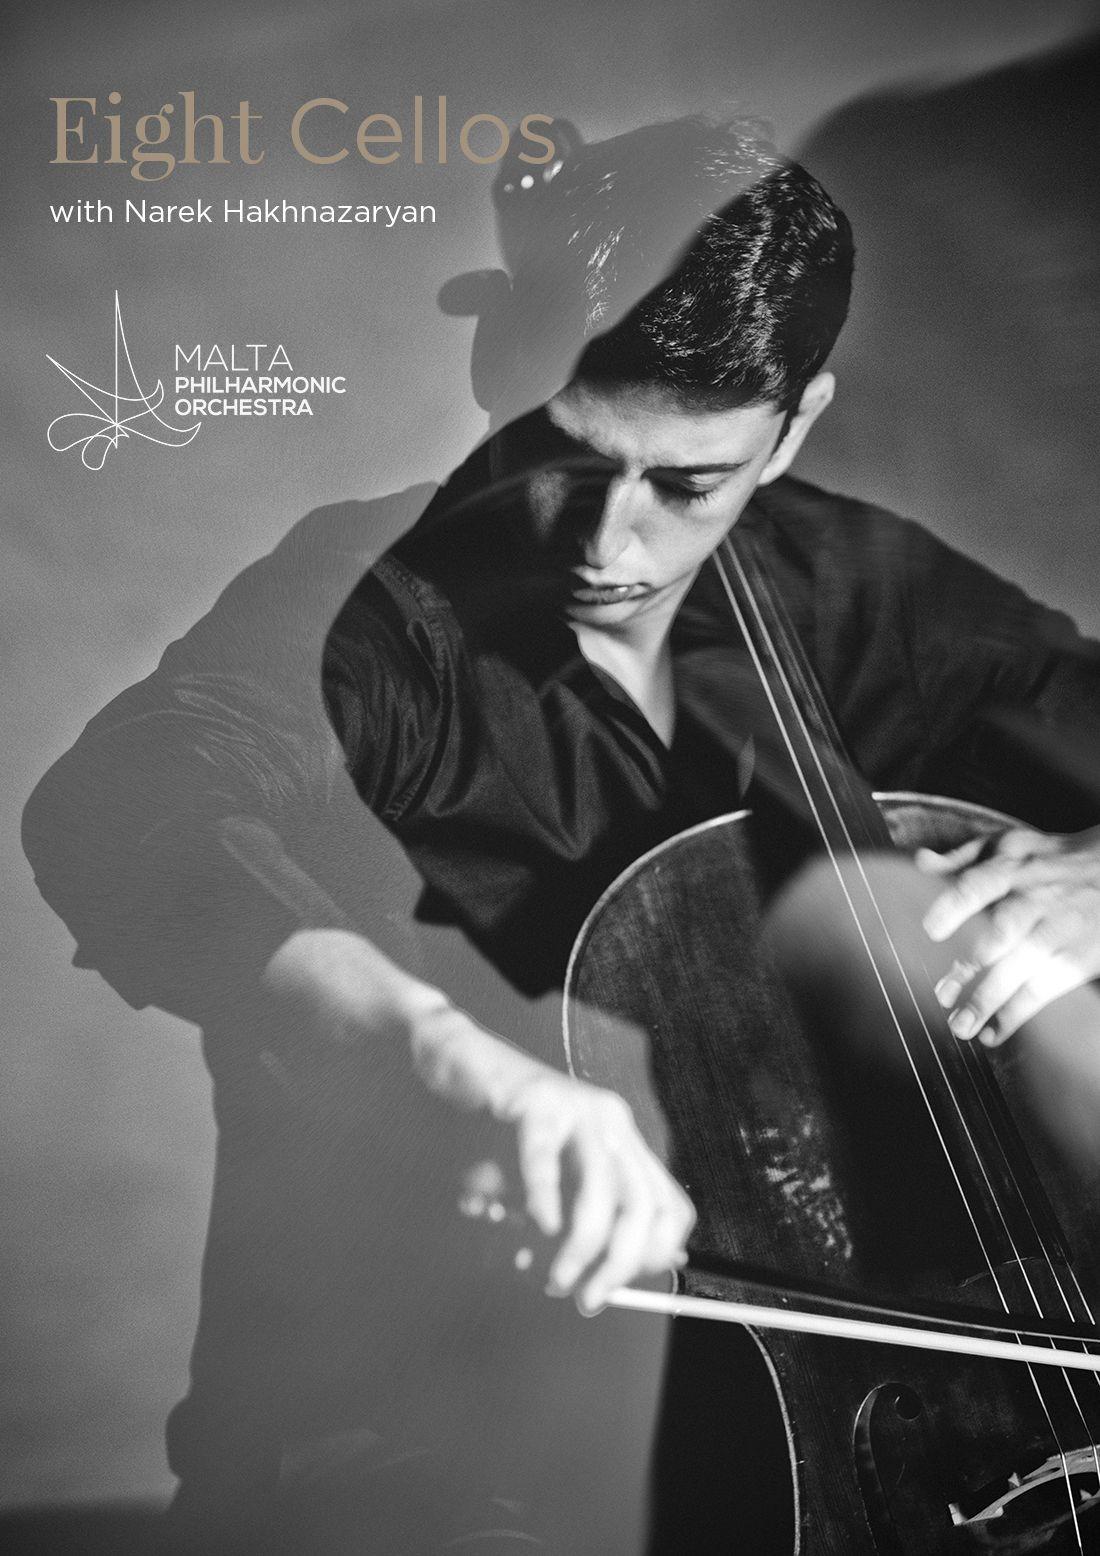 Eight Cellos with Narek Hakhnazaryan flyer